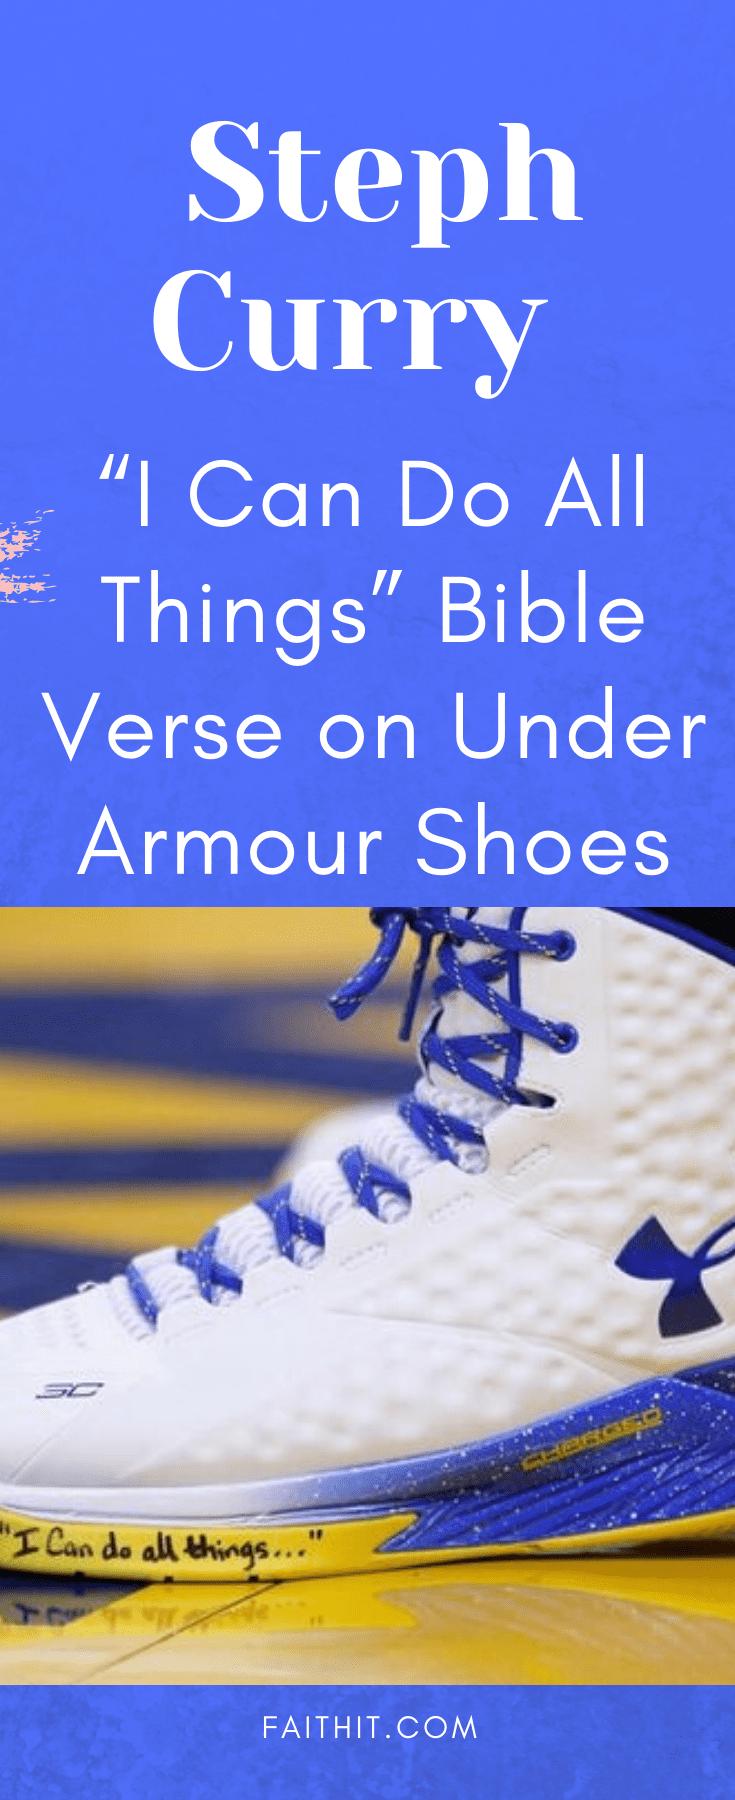 Inspirational scripture quotes